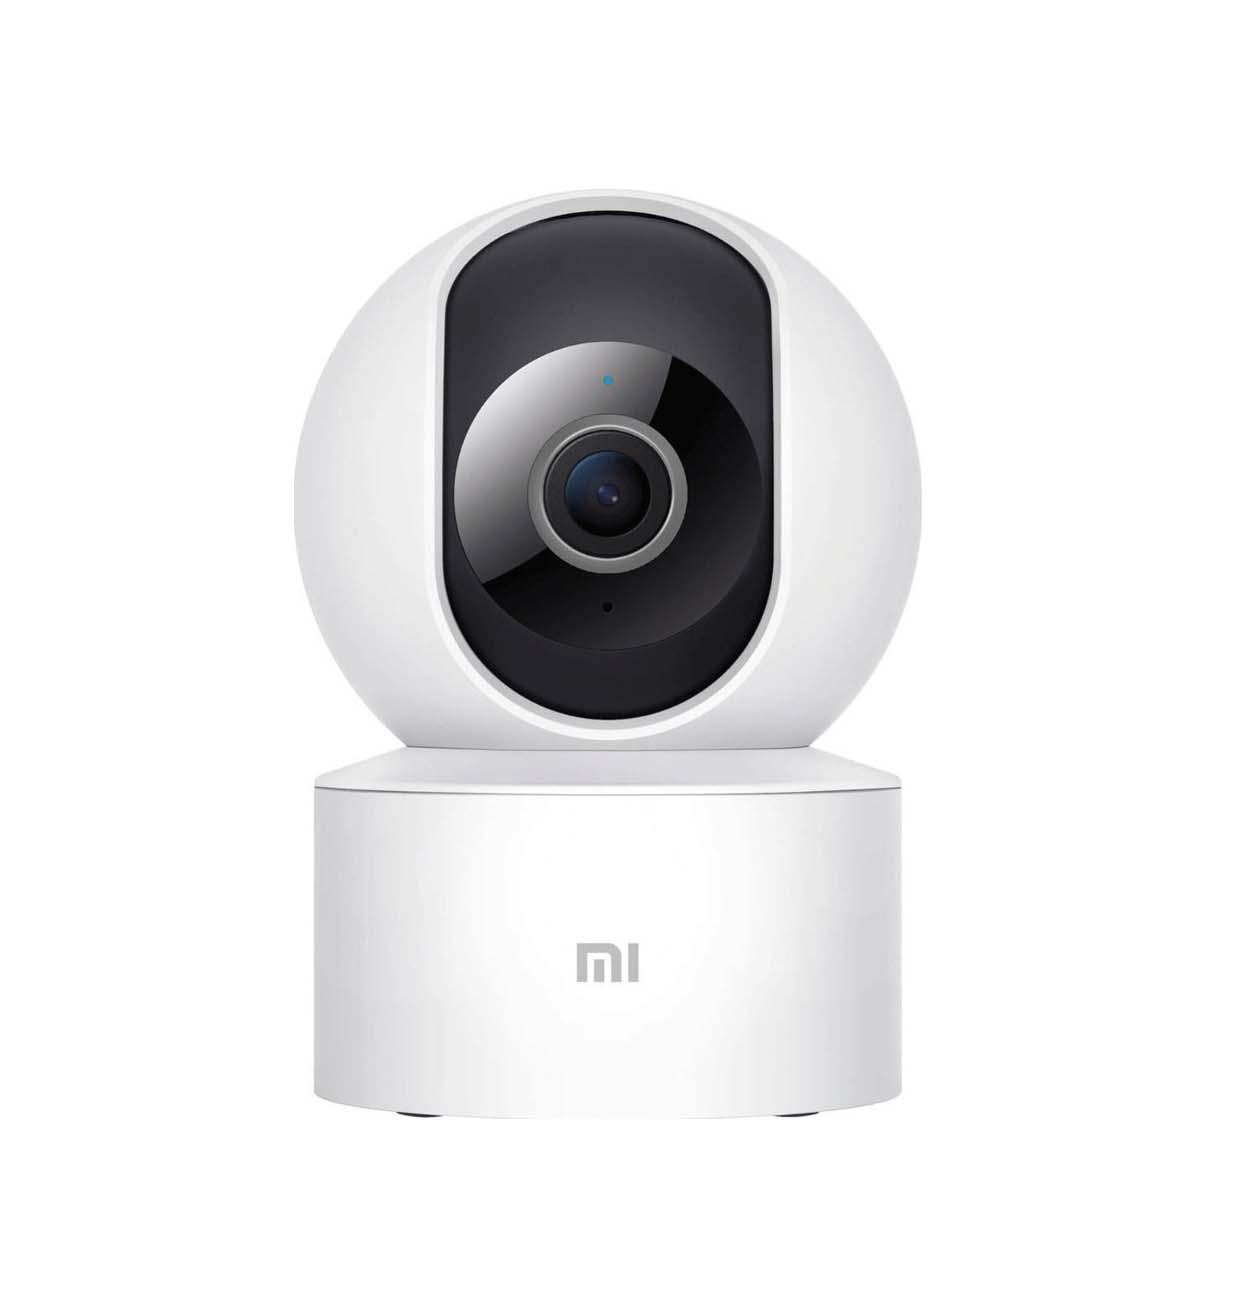 Xiaomi Mi Home Security Camera 360° 1080p White BHR4885GL (2 χρόνια εγγύηση)